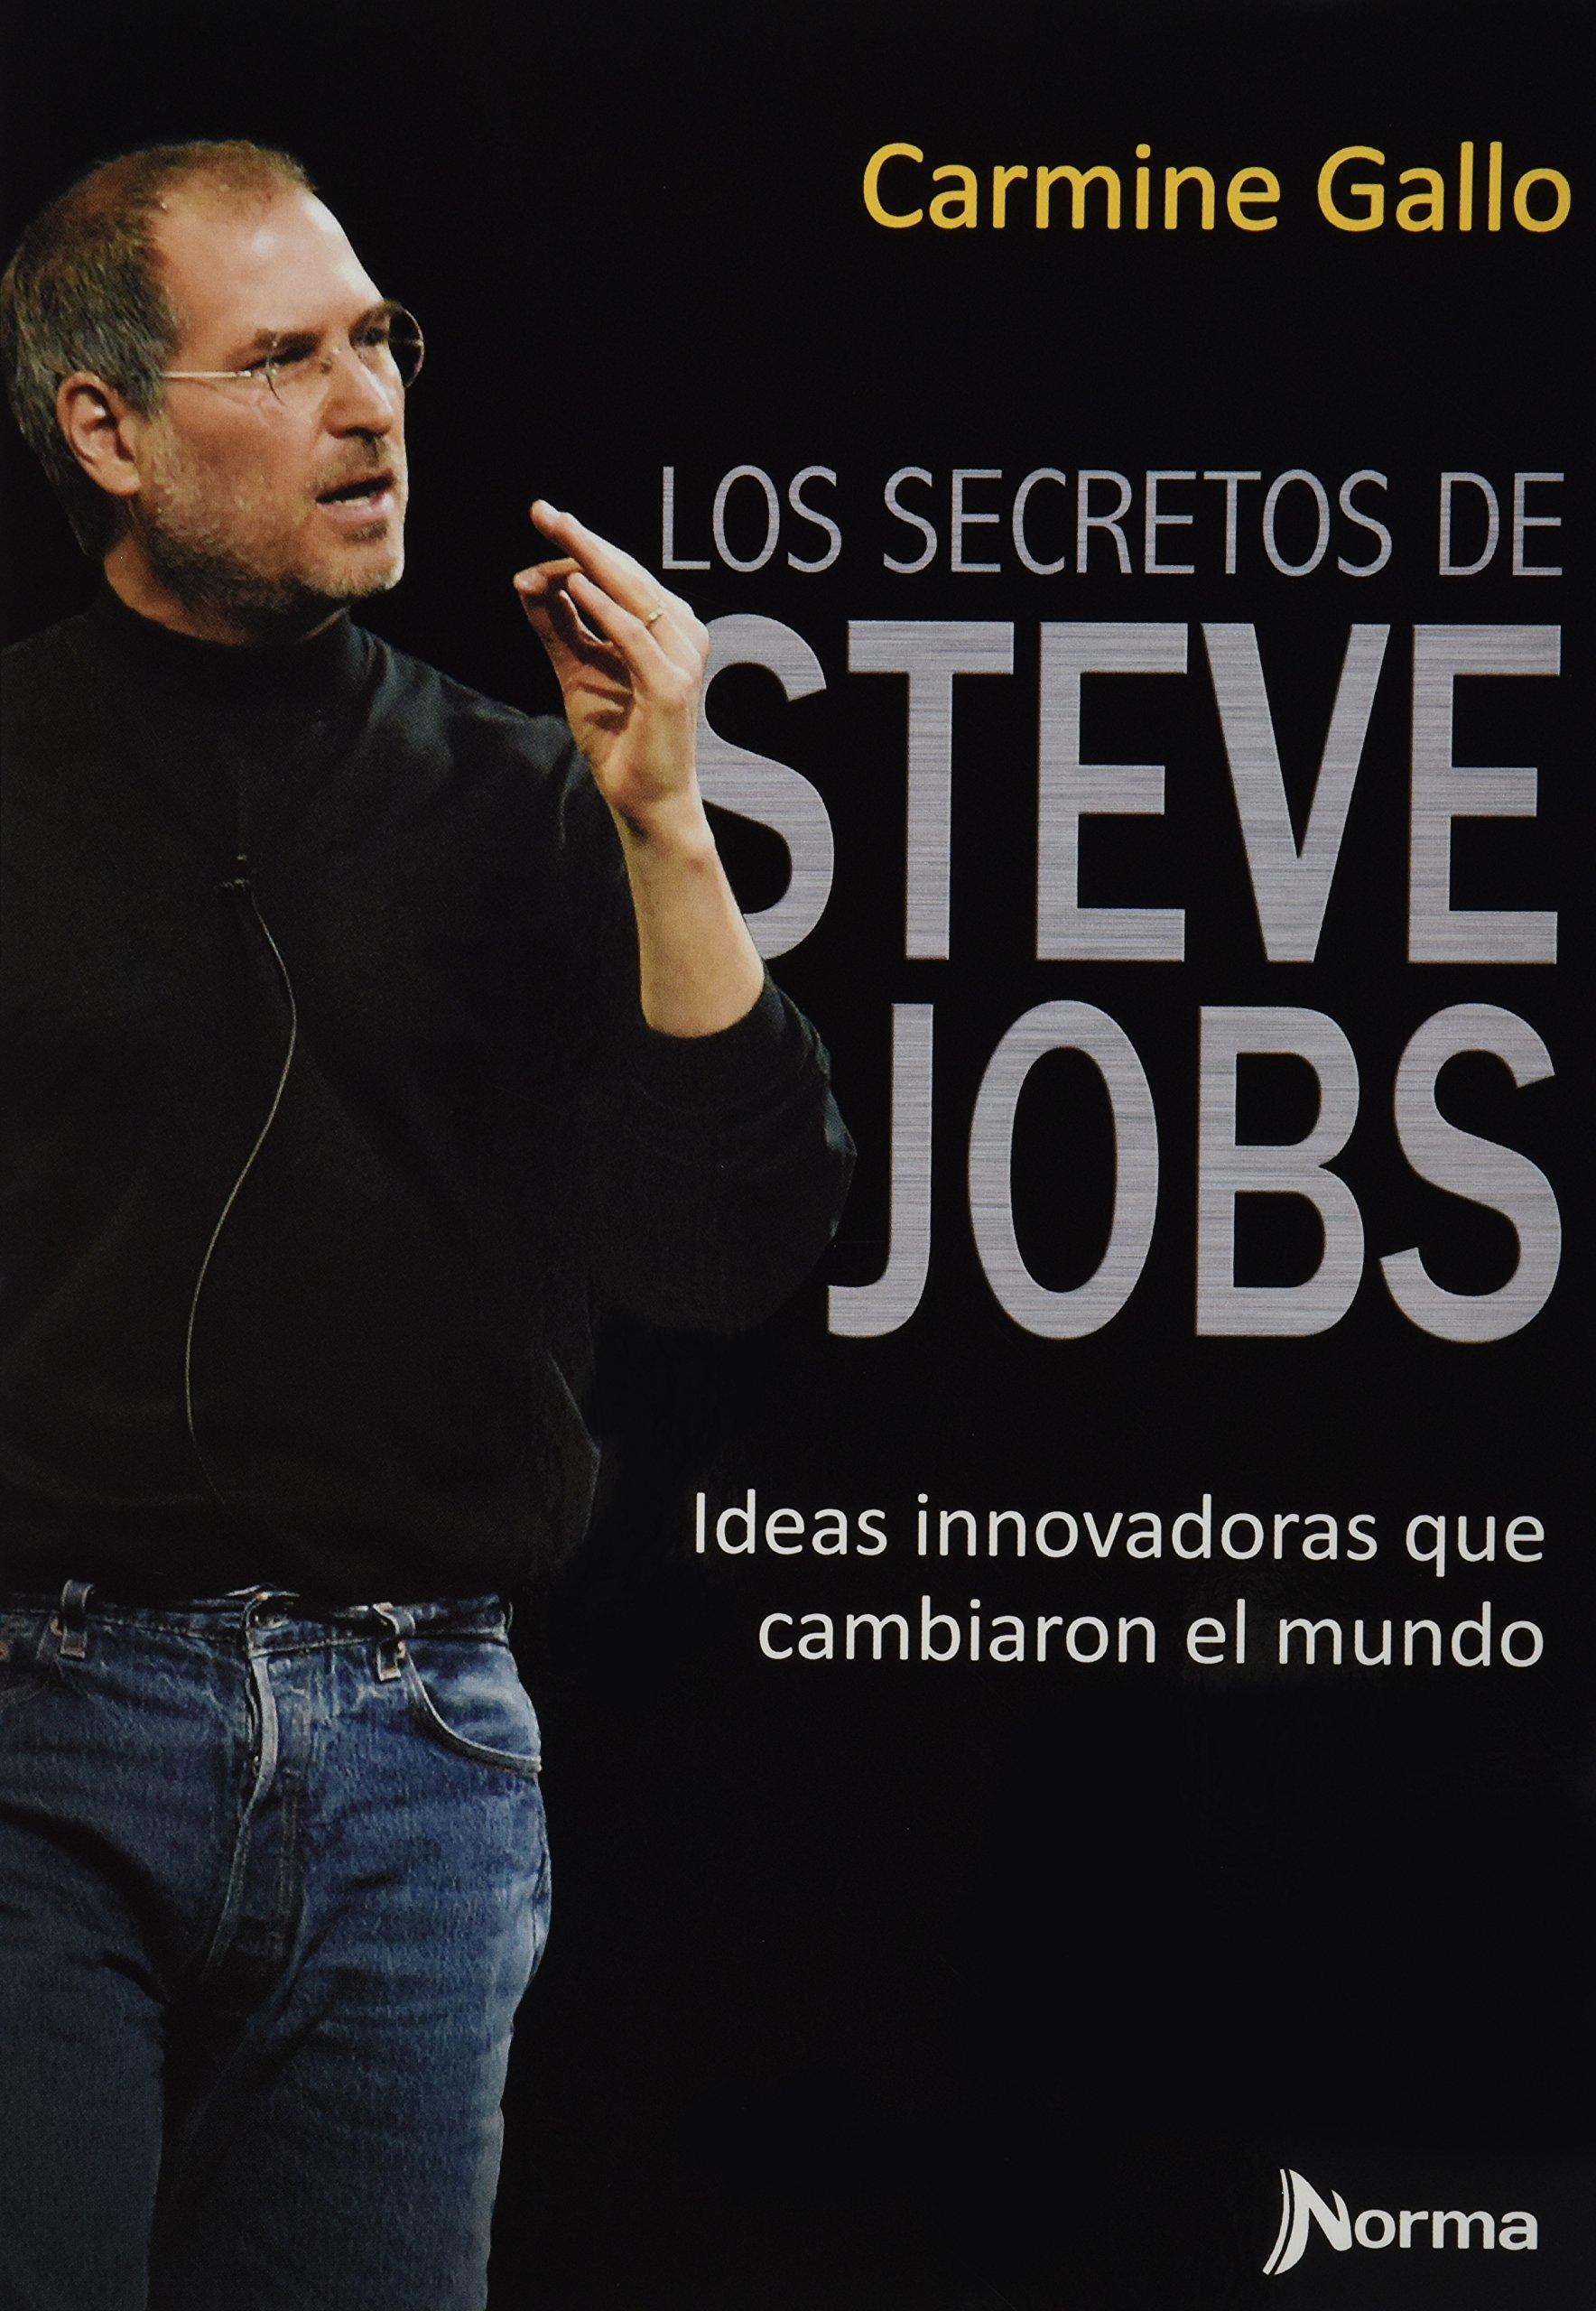 Los secretos de Steve Jobs (Spanish Edition)